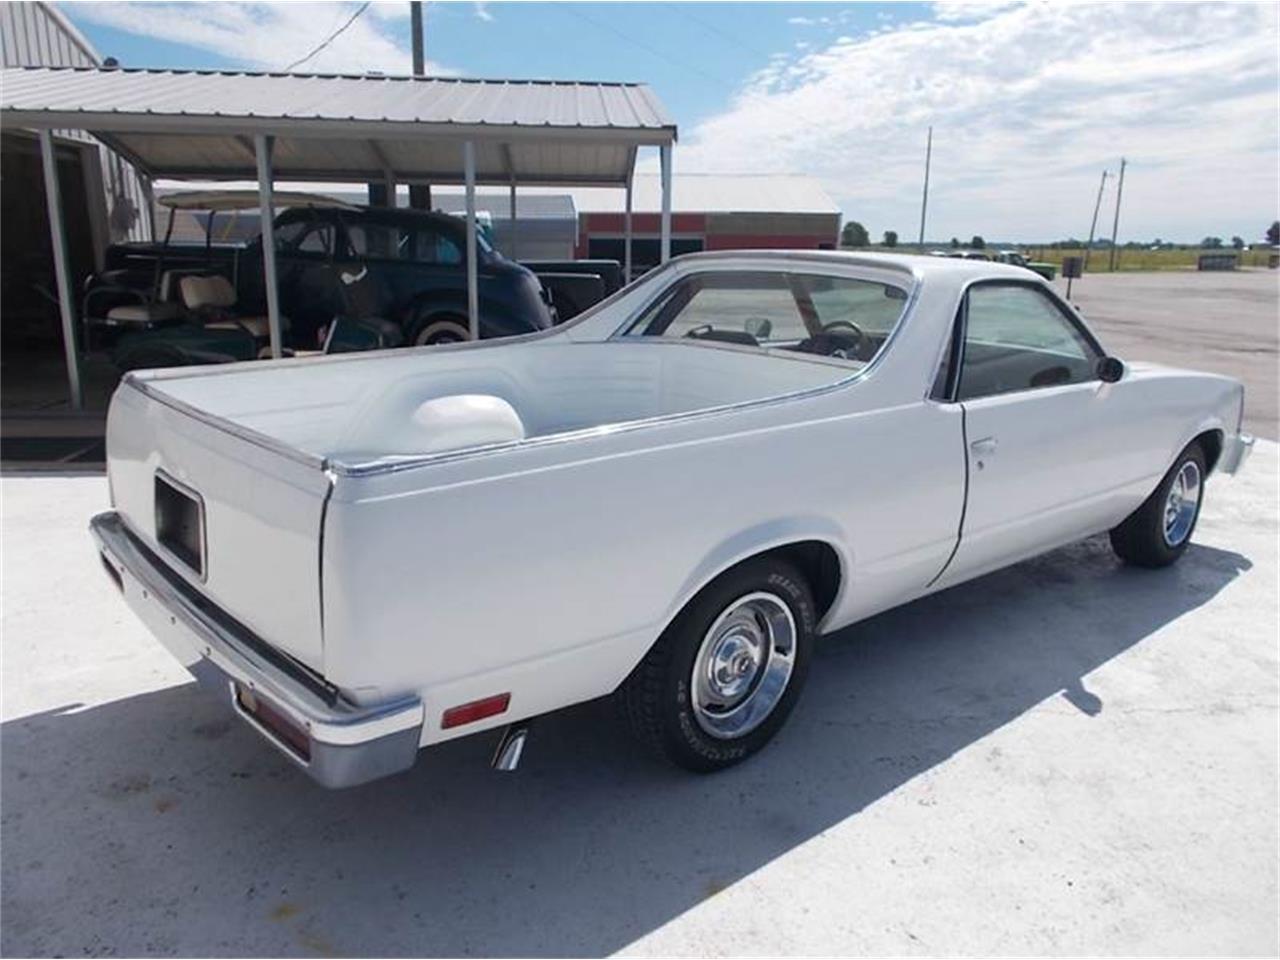 1980 Chevrolet El Camino (CC-938812) for sale in Staunton, Illinois